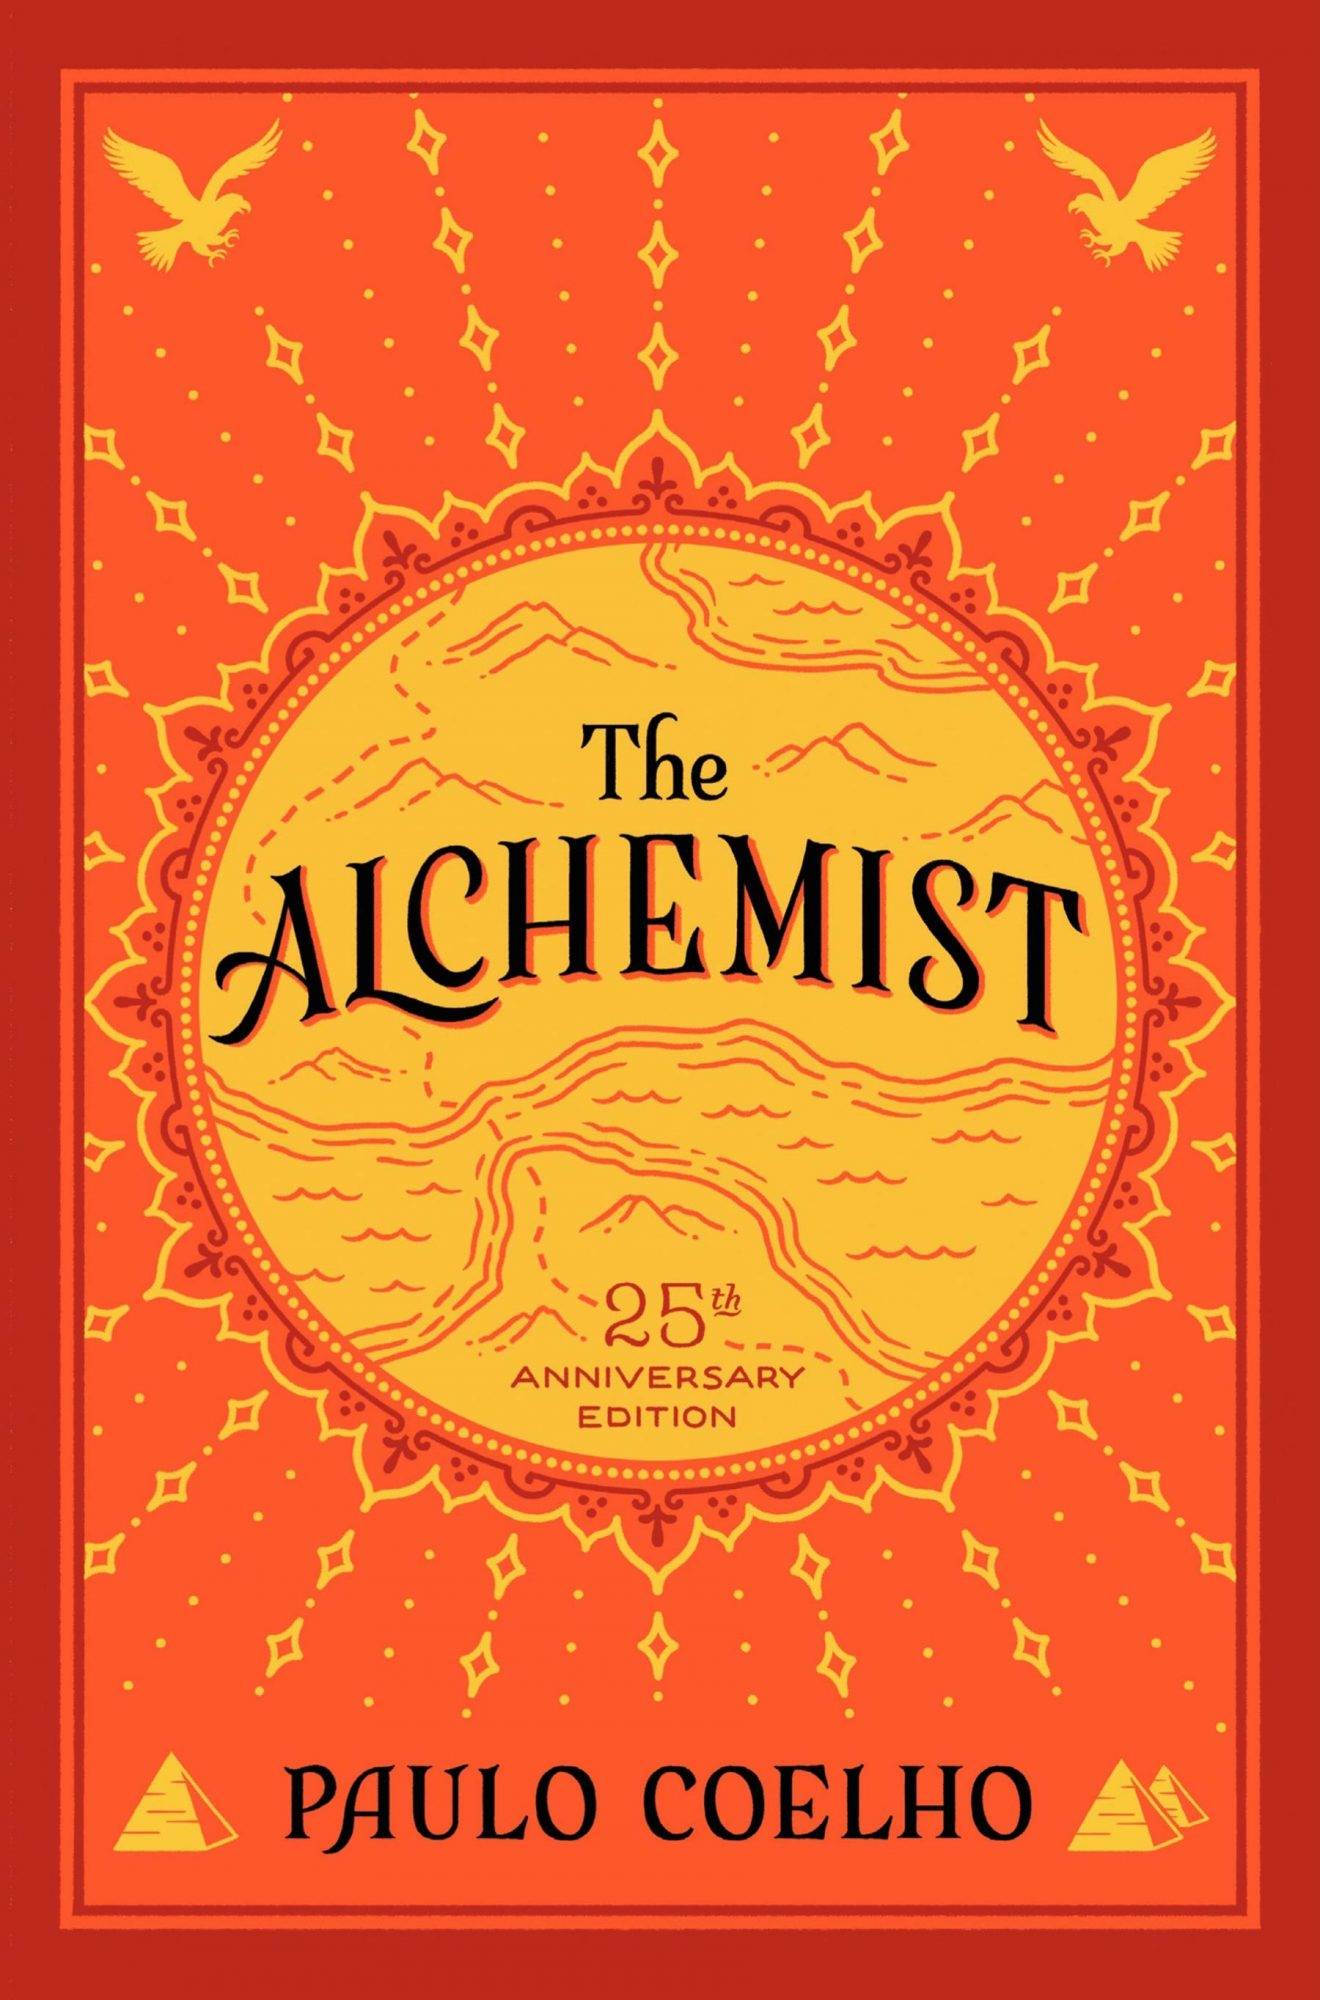 The Alchemist (25th Anniversary Edition) - paperback (4/15/14)by Paulo Coelho